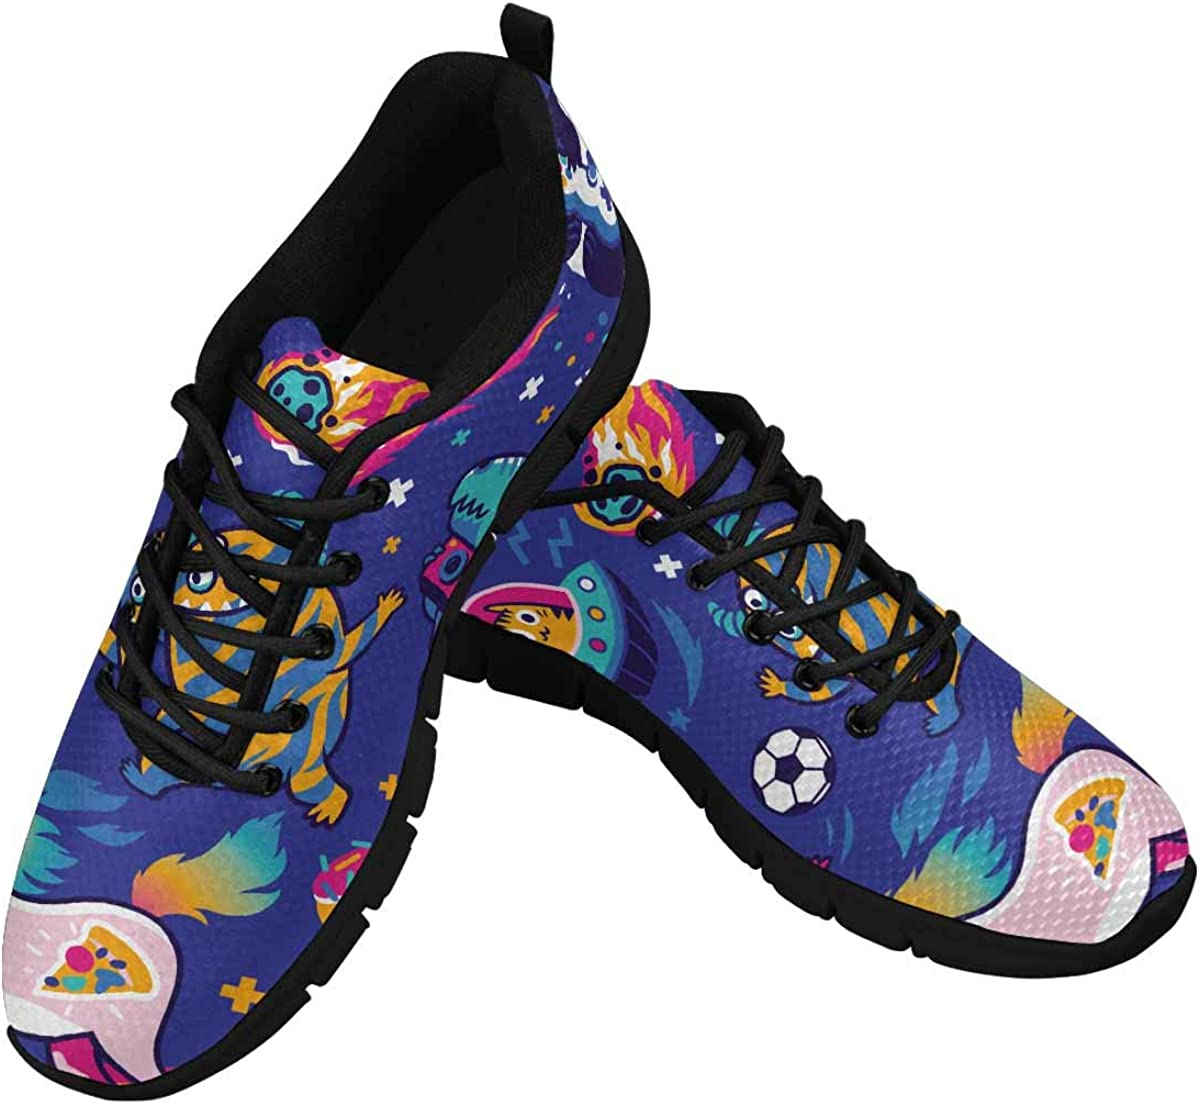 INTERESTPRINT Cosmic Aliens, Cool Unicorn, Panda Gamer Women Walking Shoes Comfortable Lightweight Work Casual Travel Sneakers